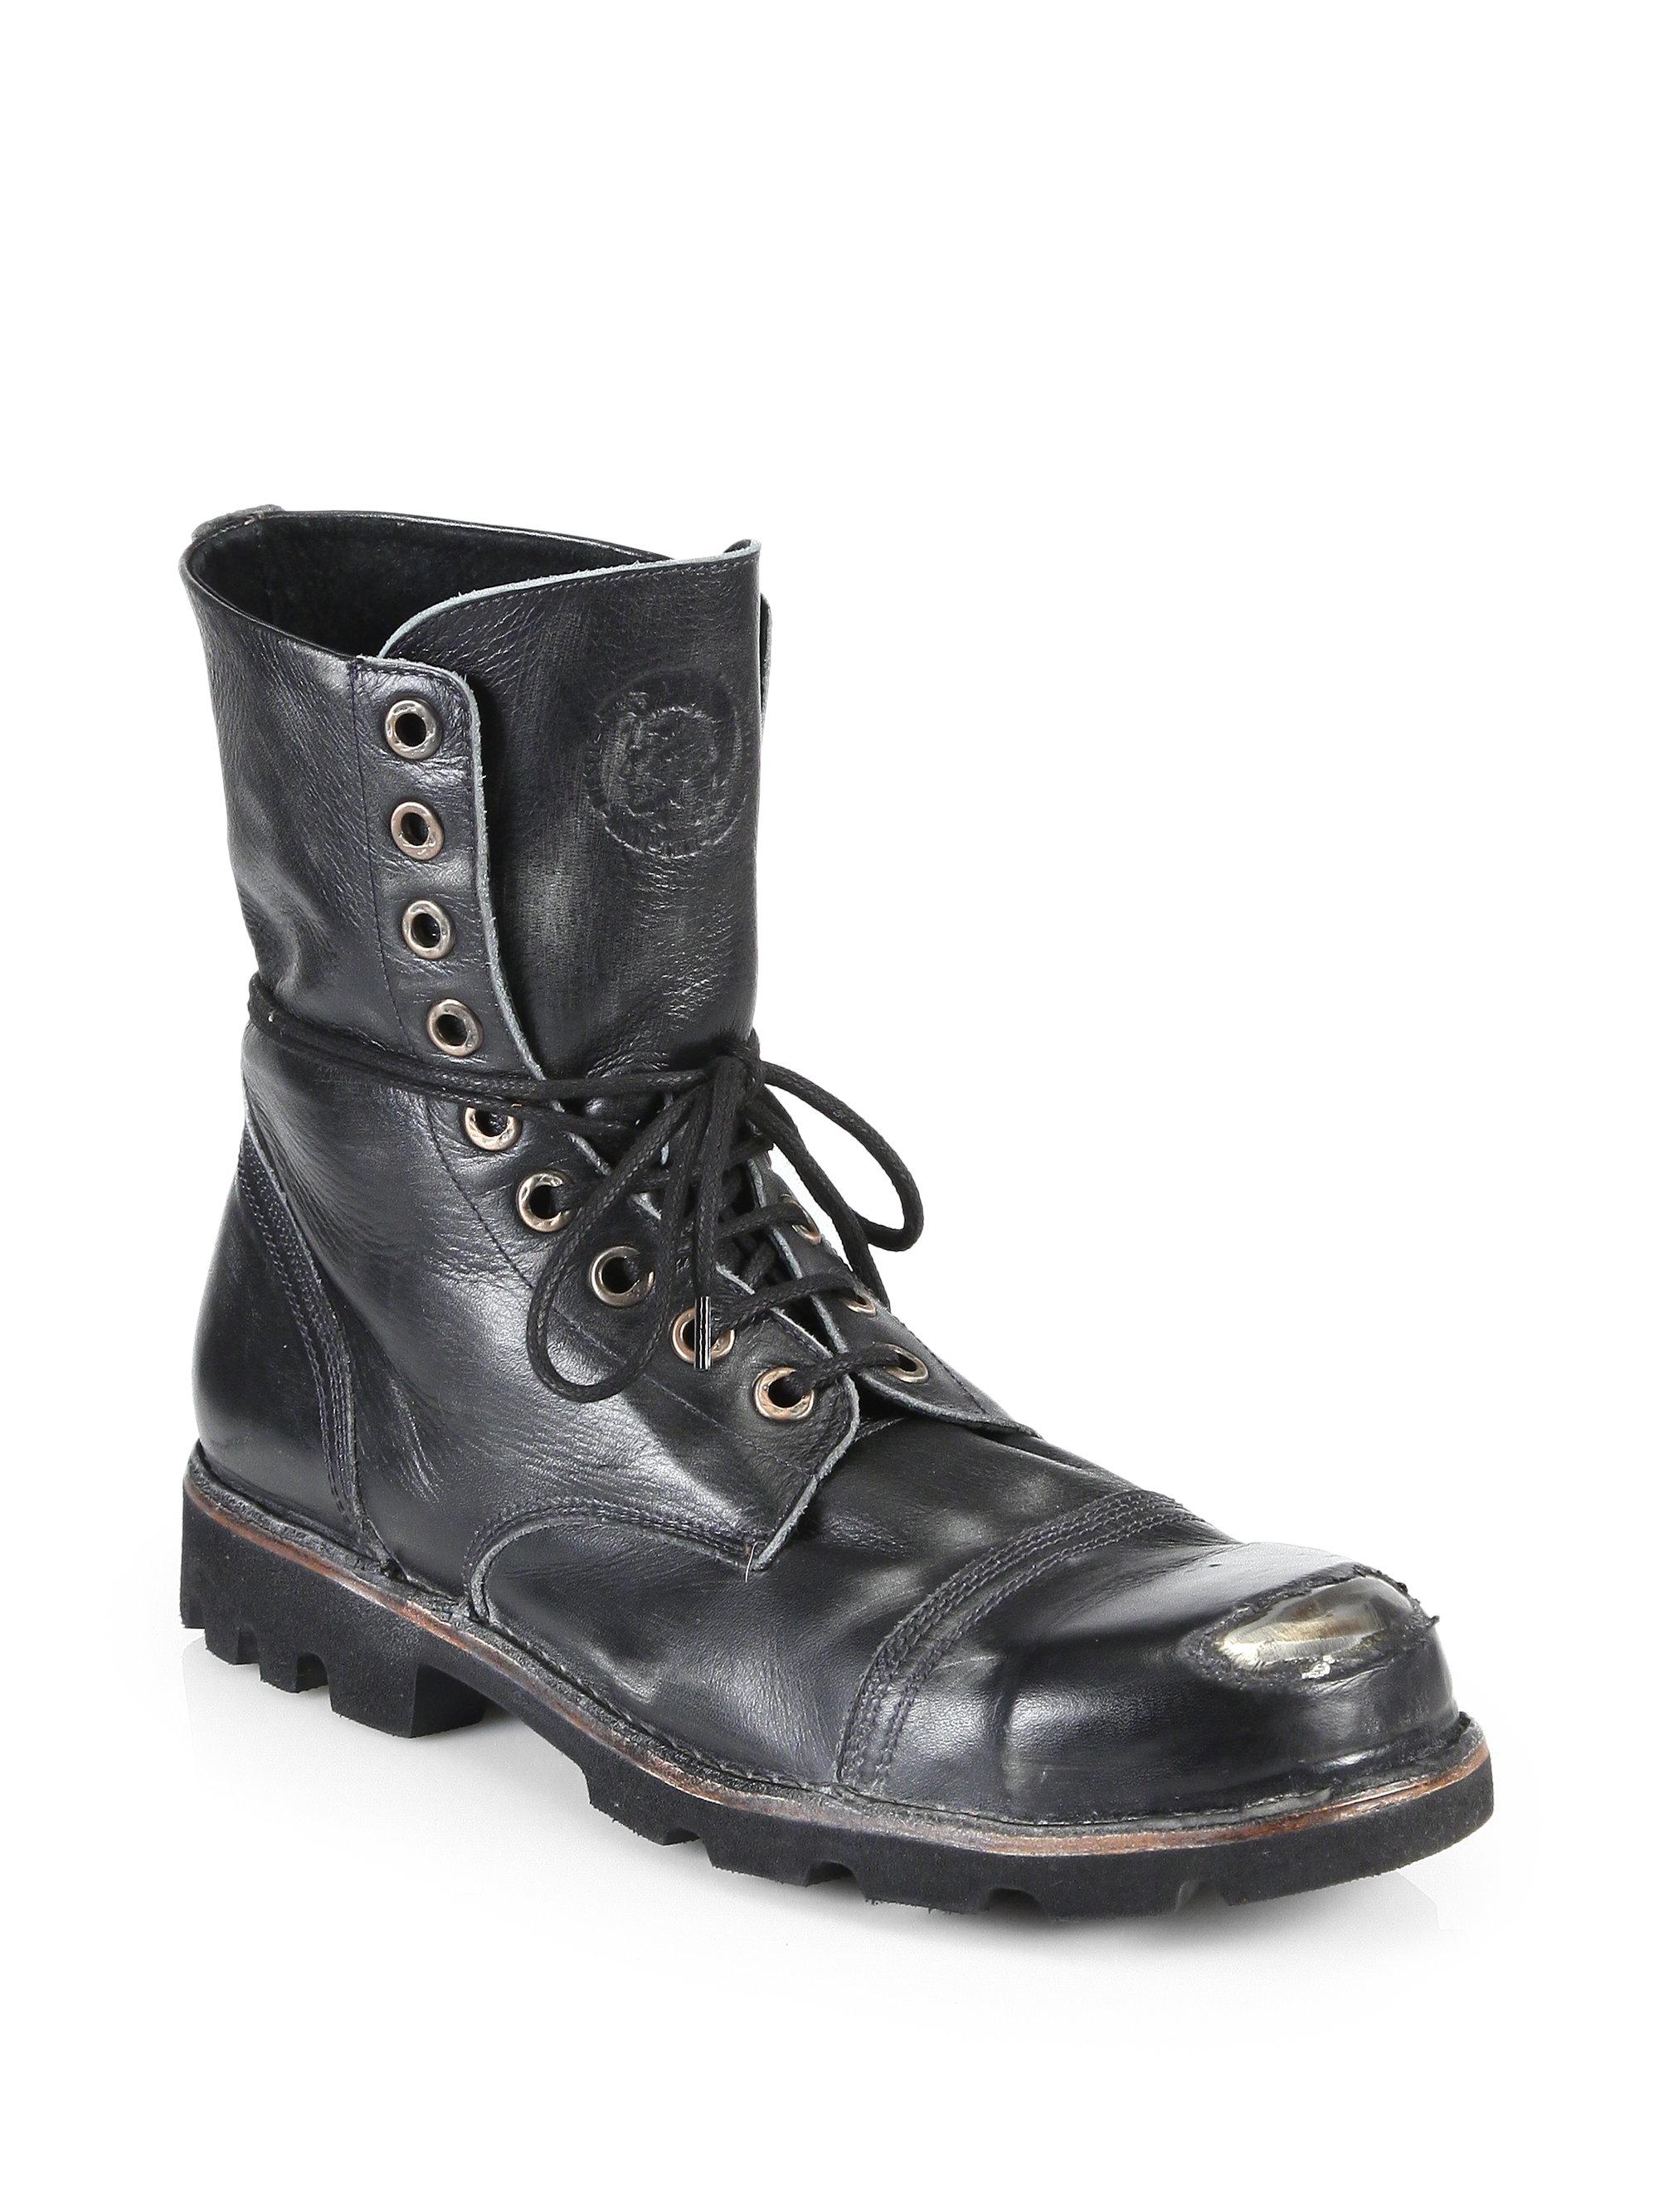 Lyst - Diesel Hardkor Steel Lace-up Boots in Black for Men